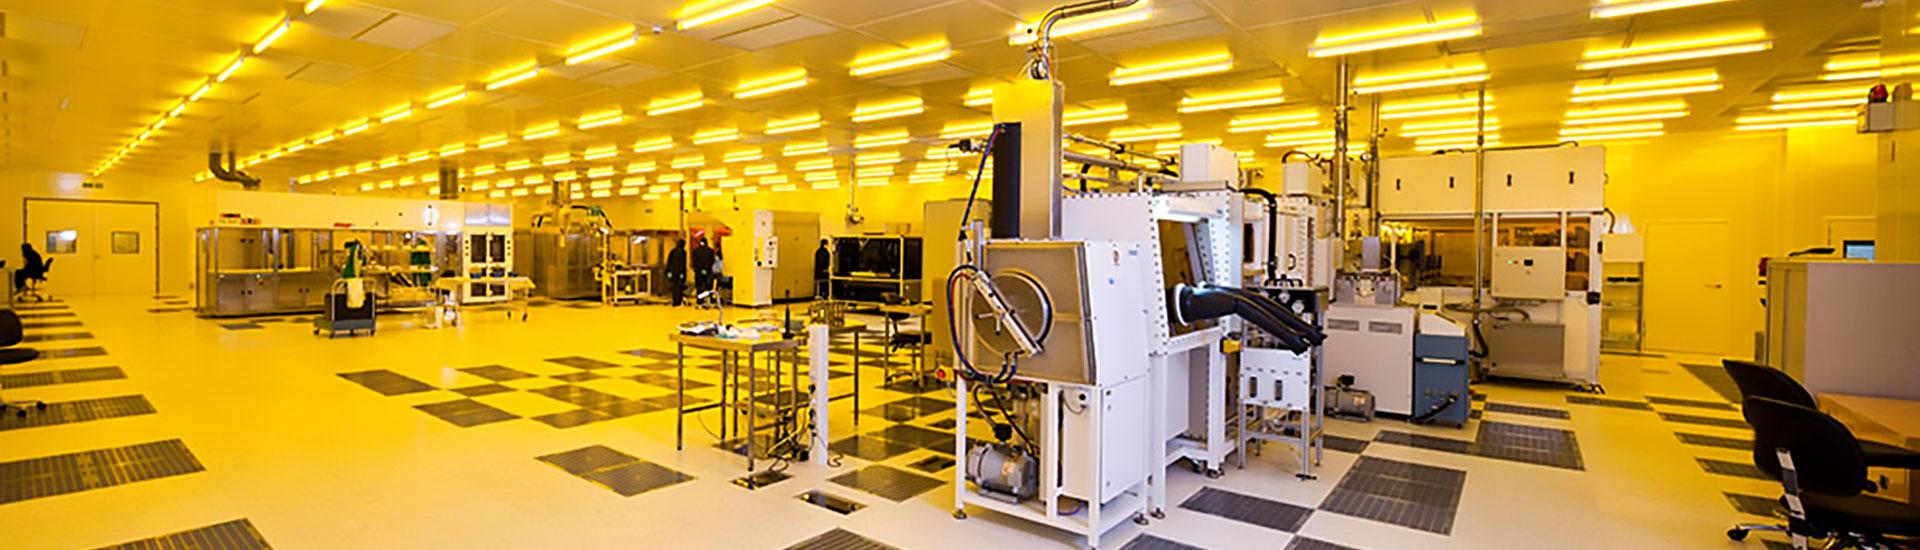 technology-factory-neudrive